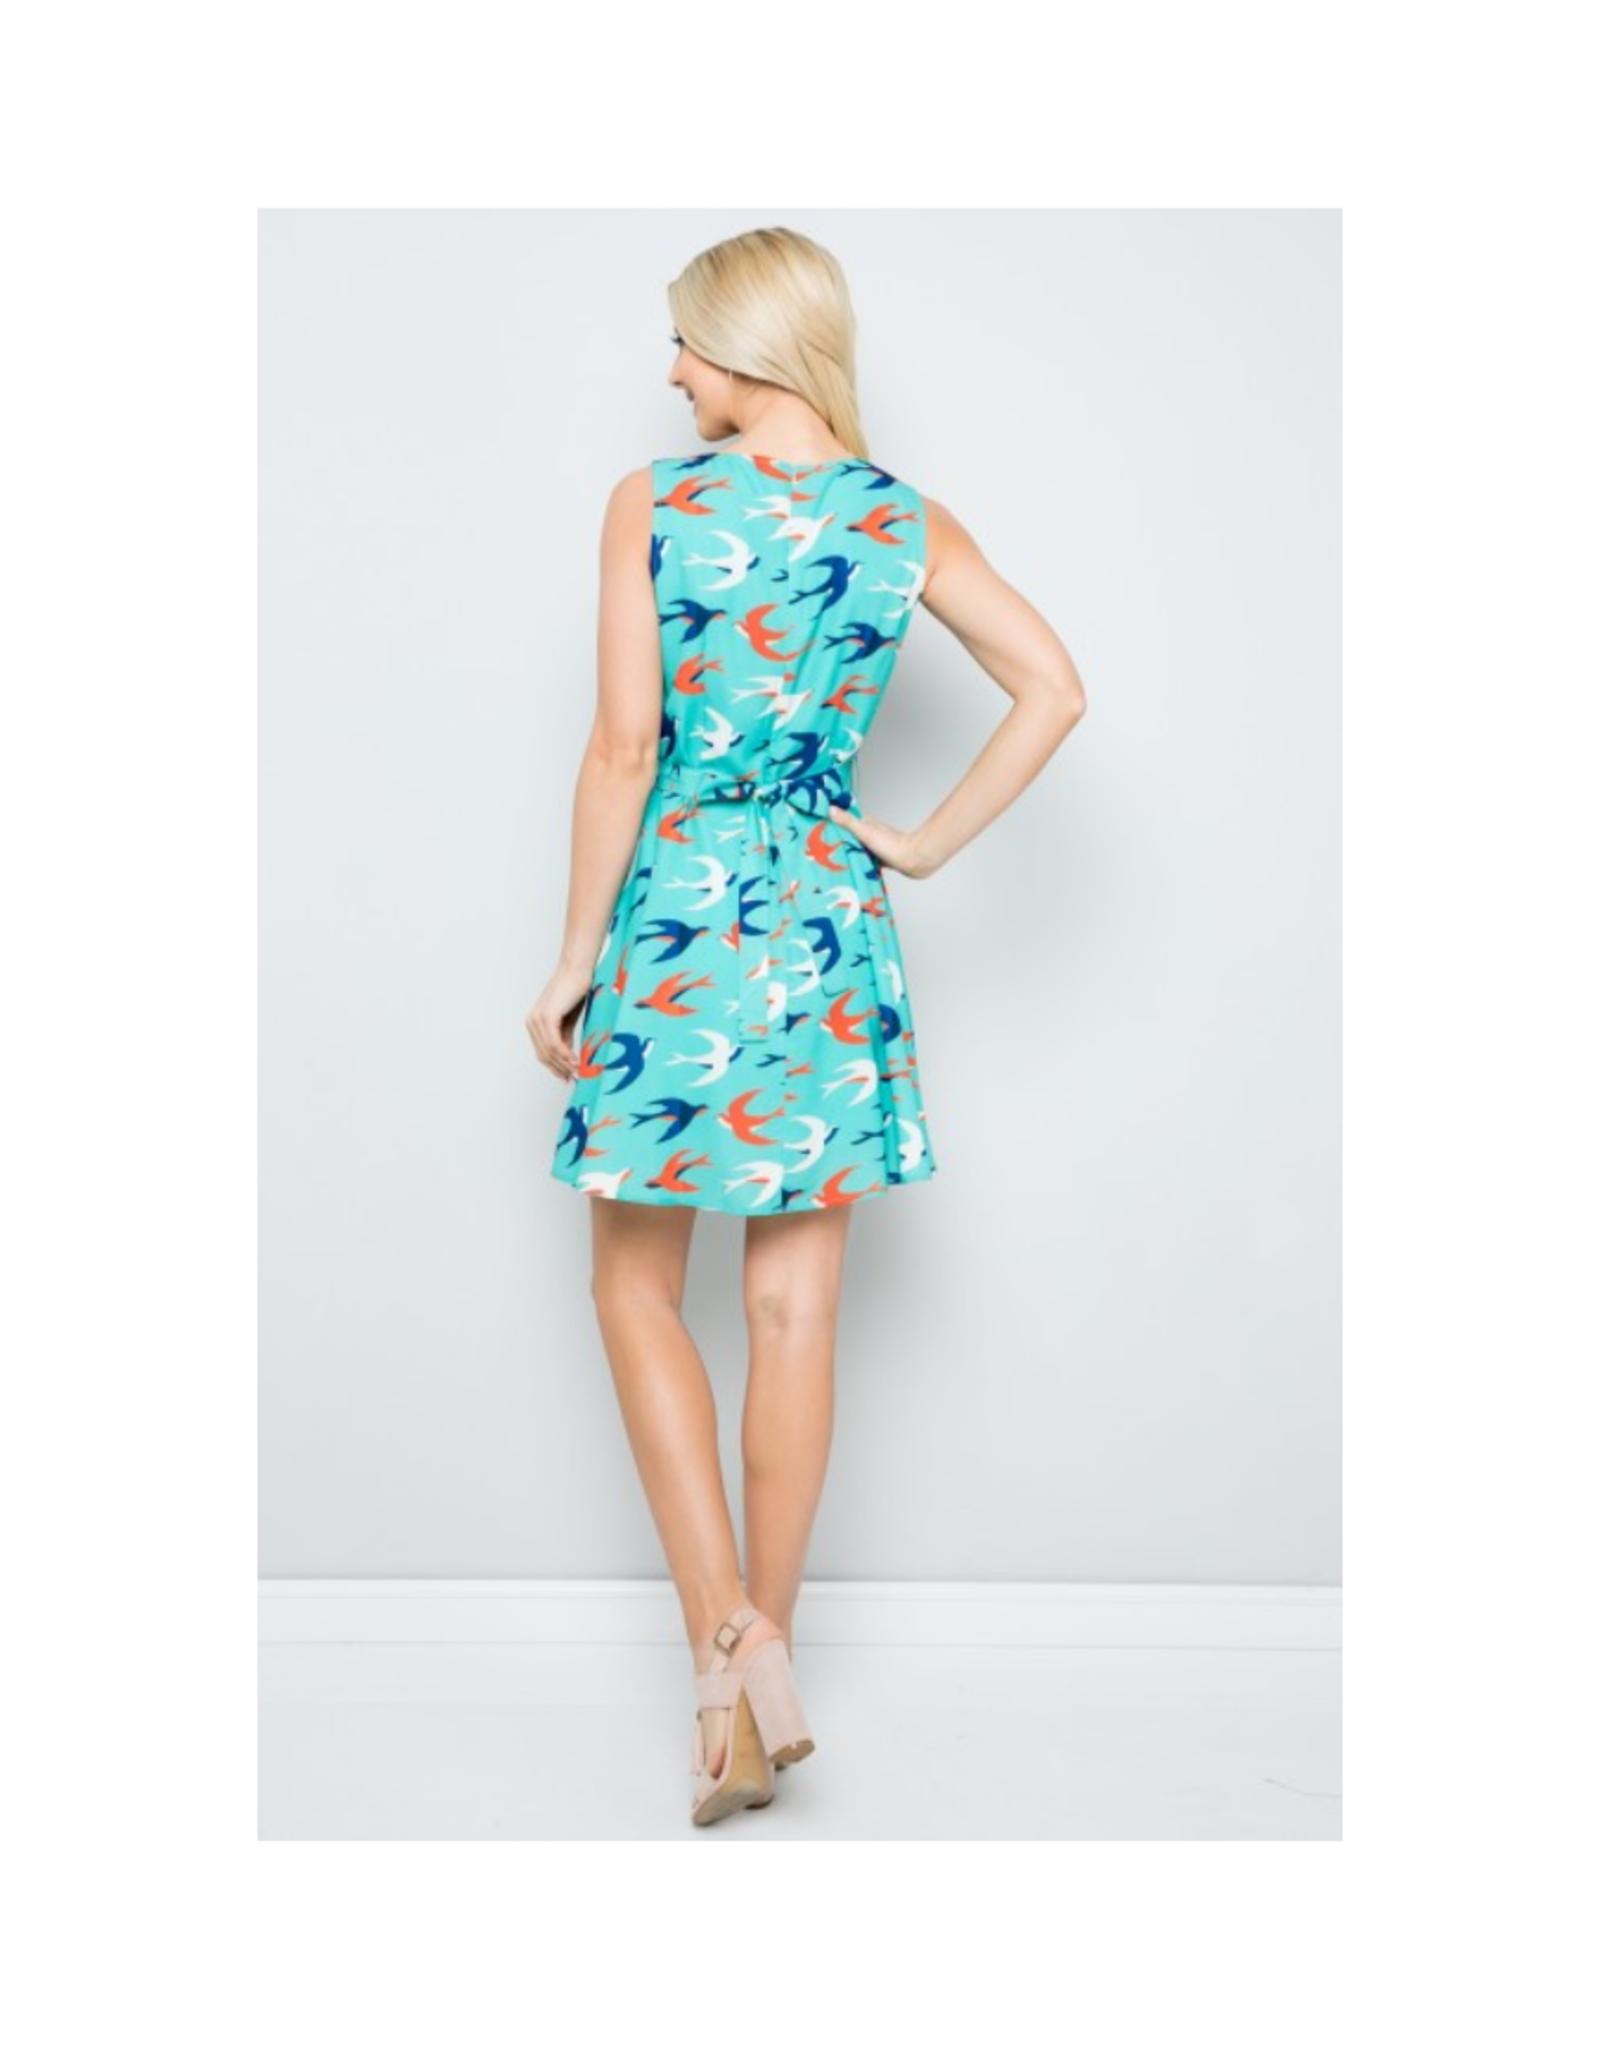 Sparrow Print Skater Dress